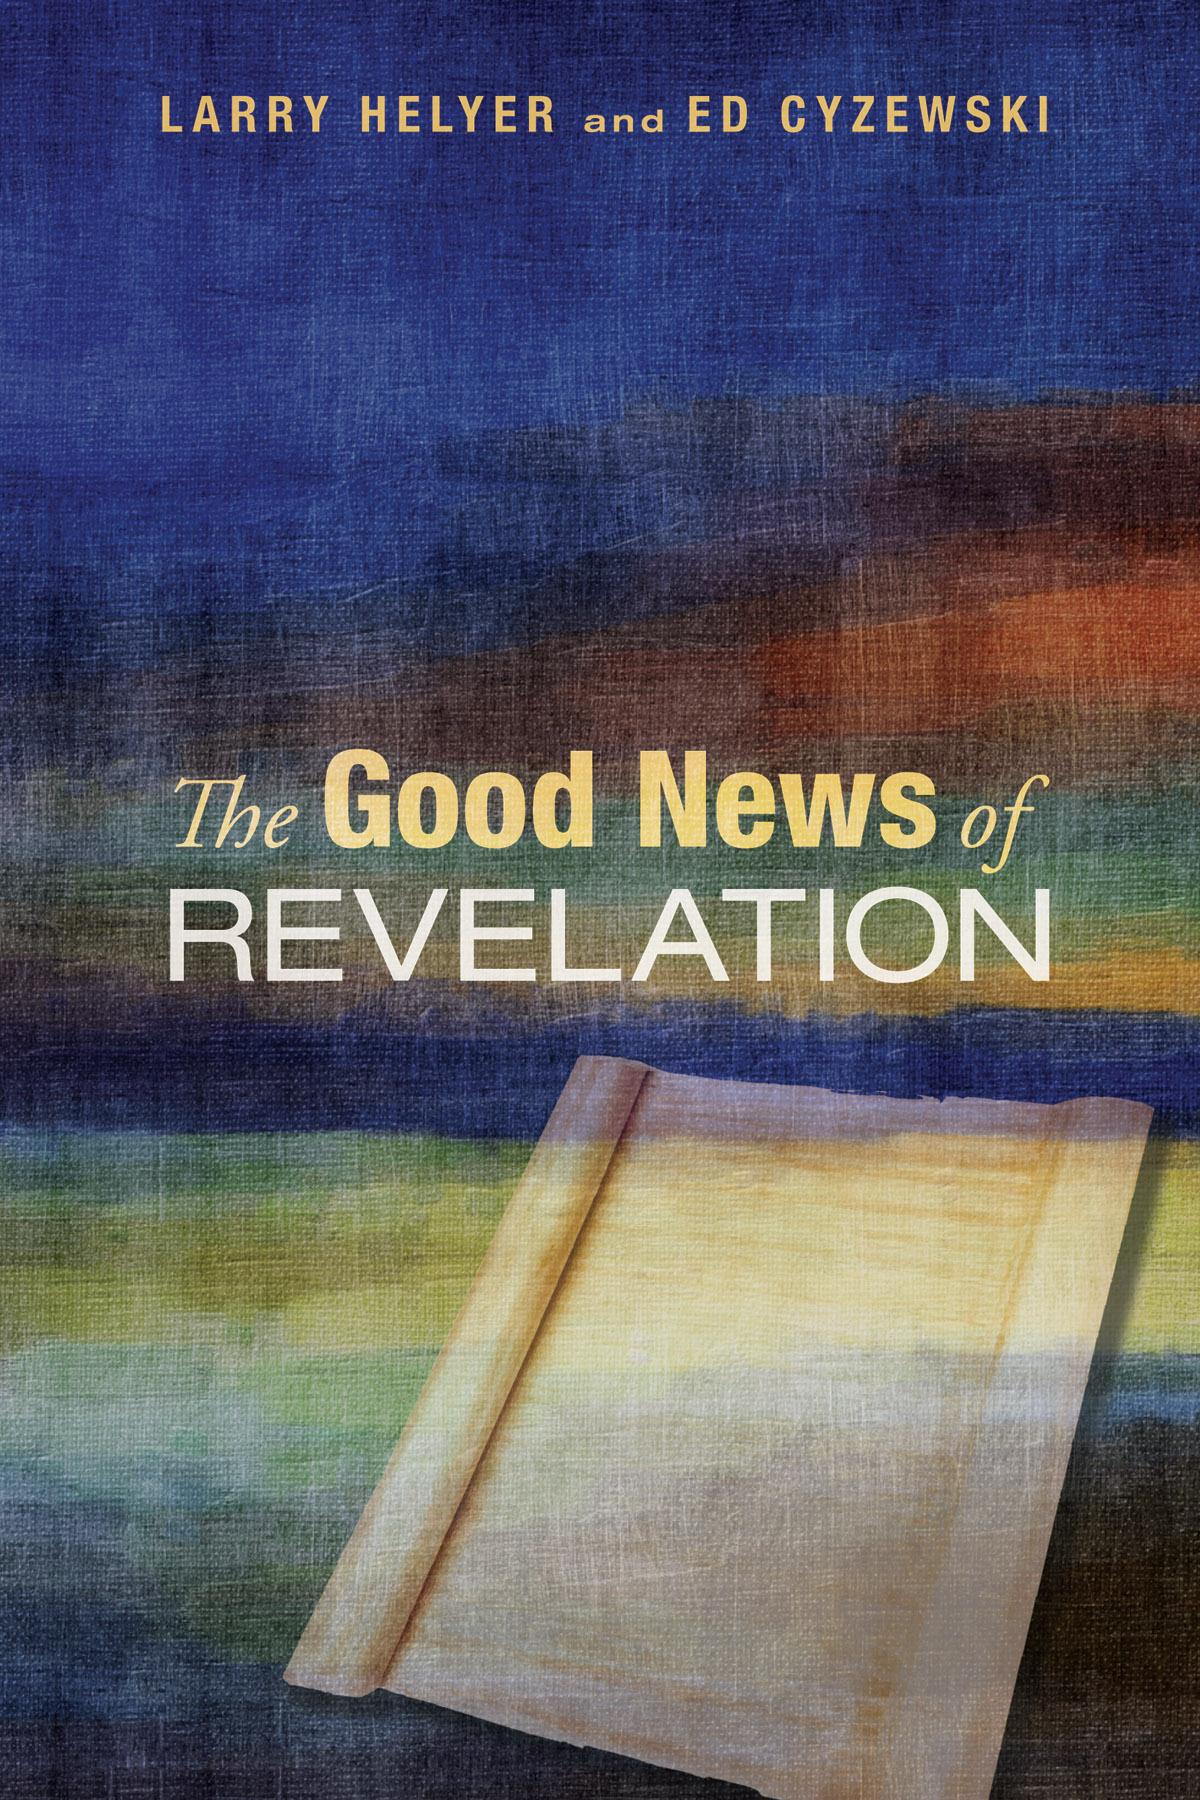 The Good News of Revelation